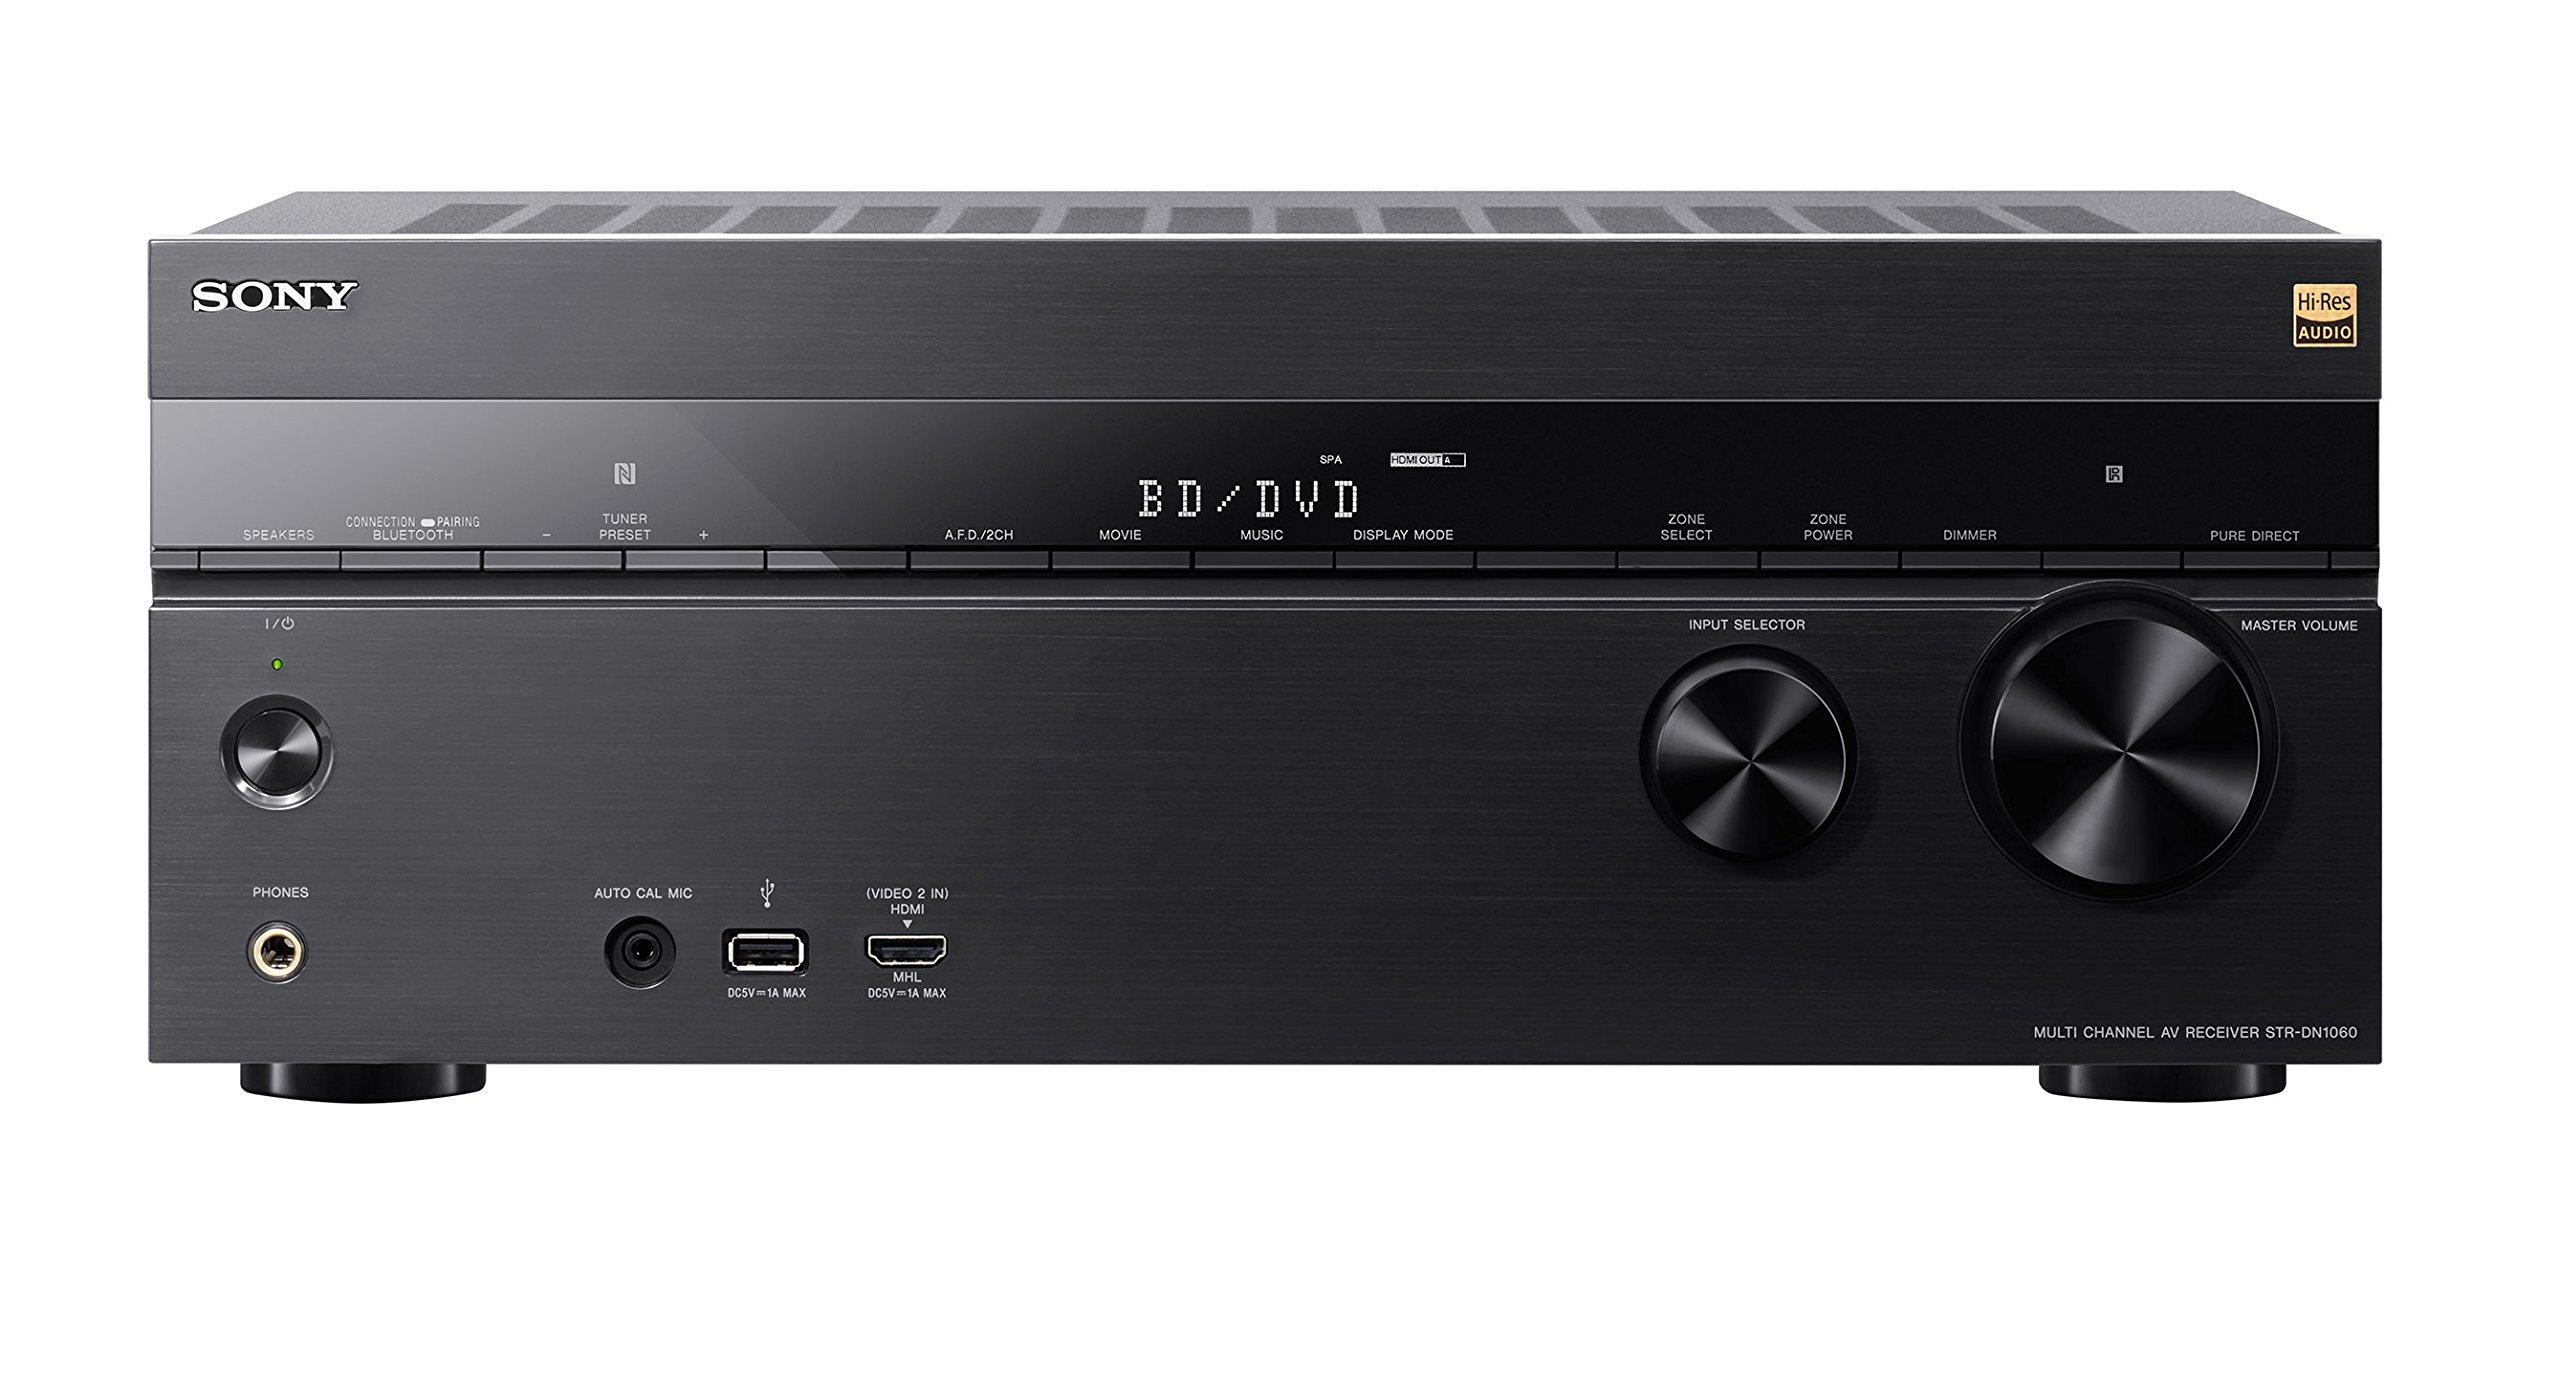 Sony STRDN1060 7.2 Channel Hi-Res WiFi Network AV